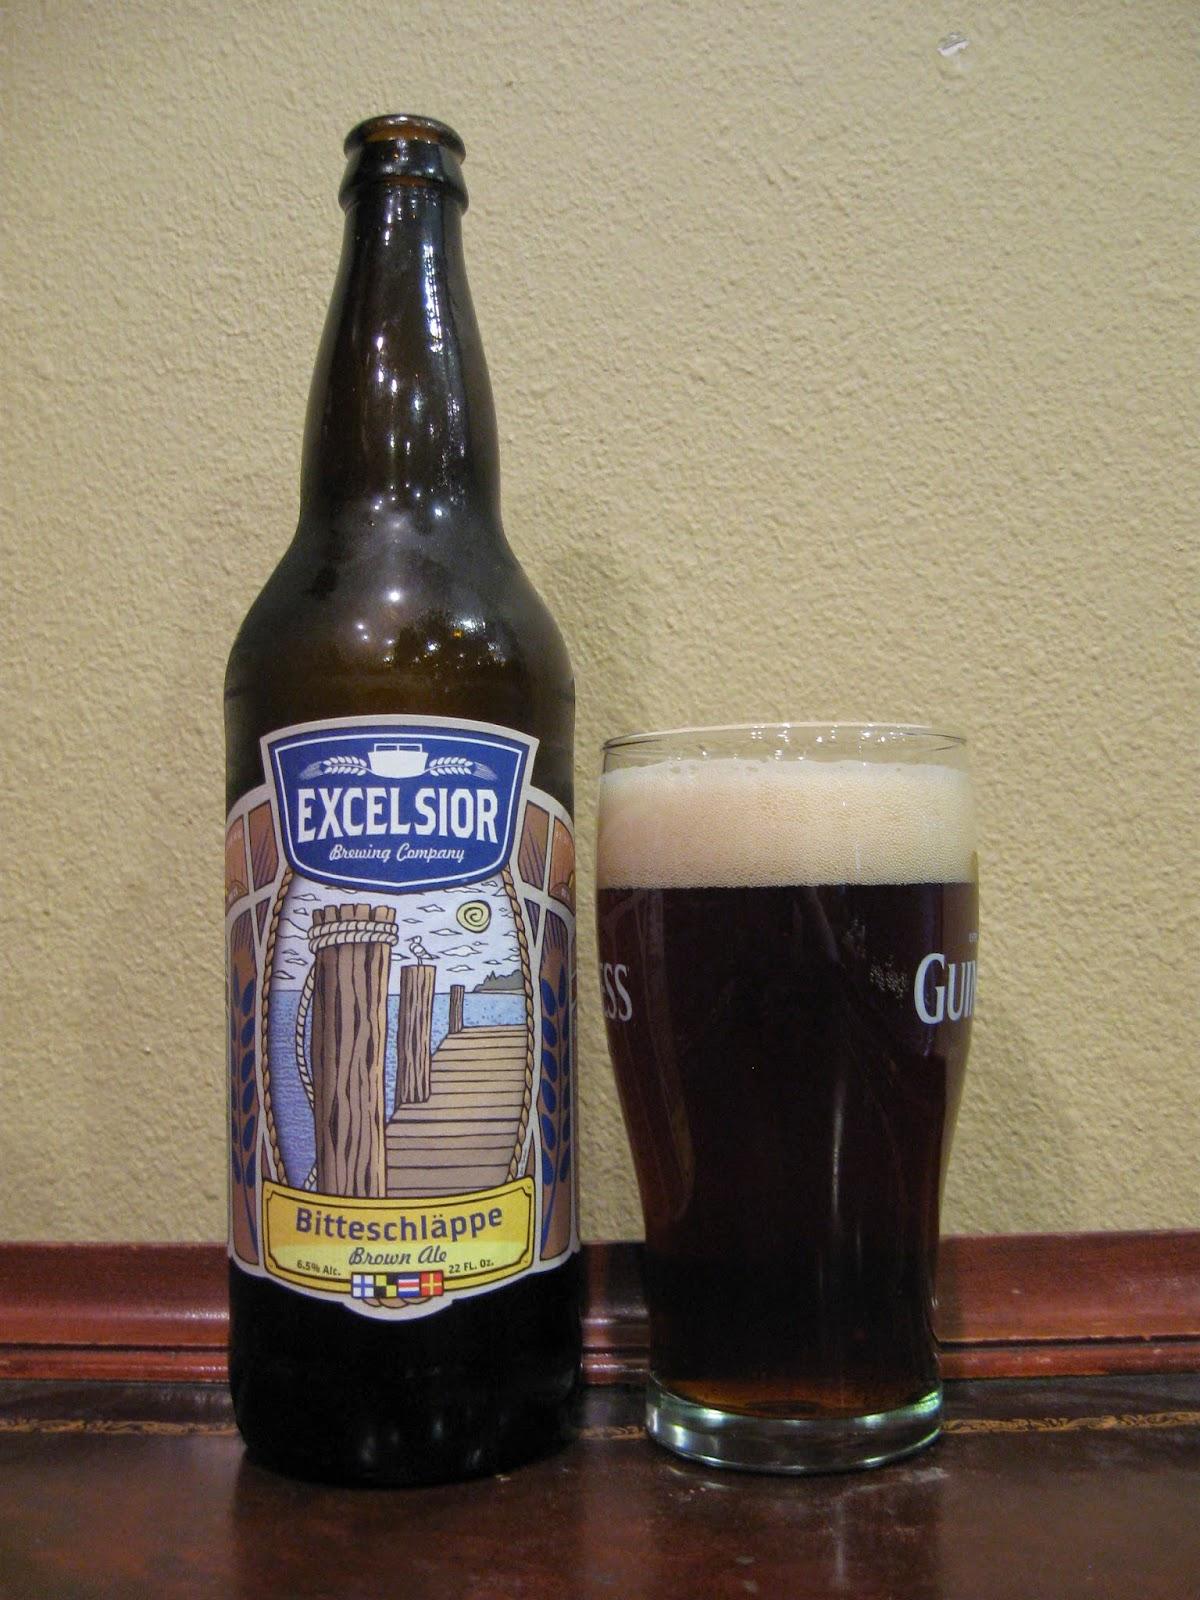 doing beer justice excelsior bitteschlappe brown ale